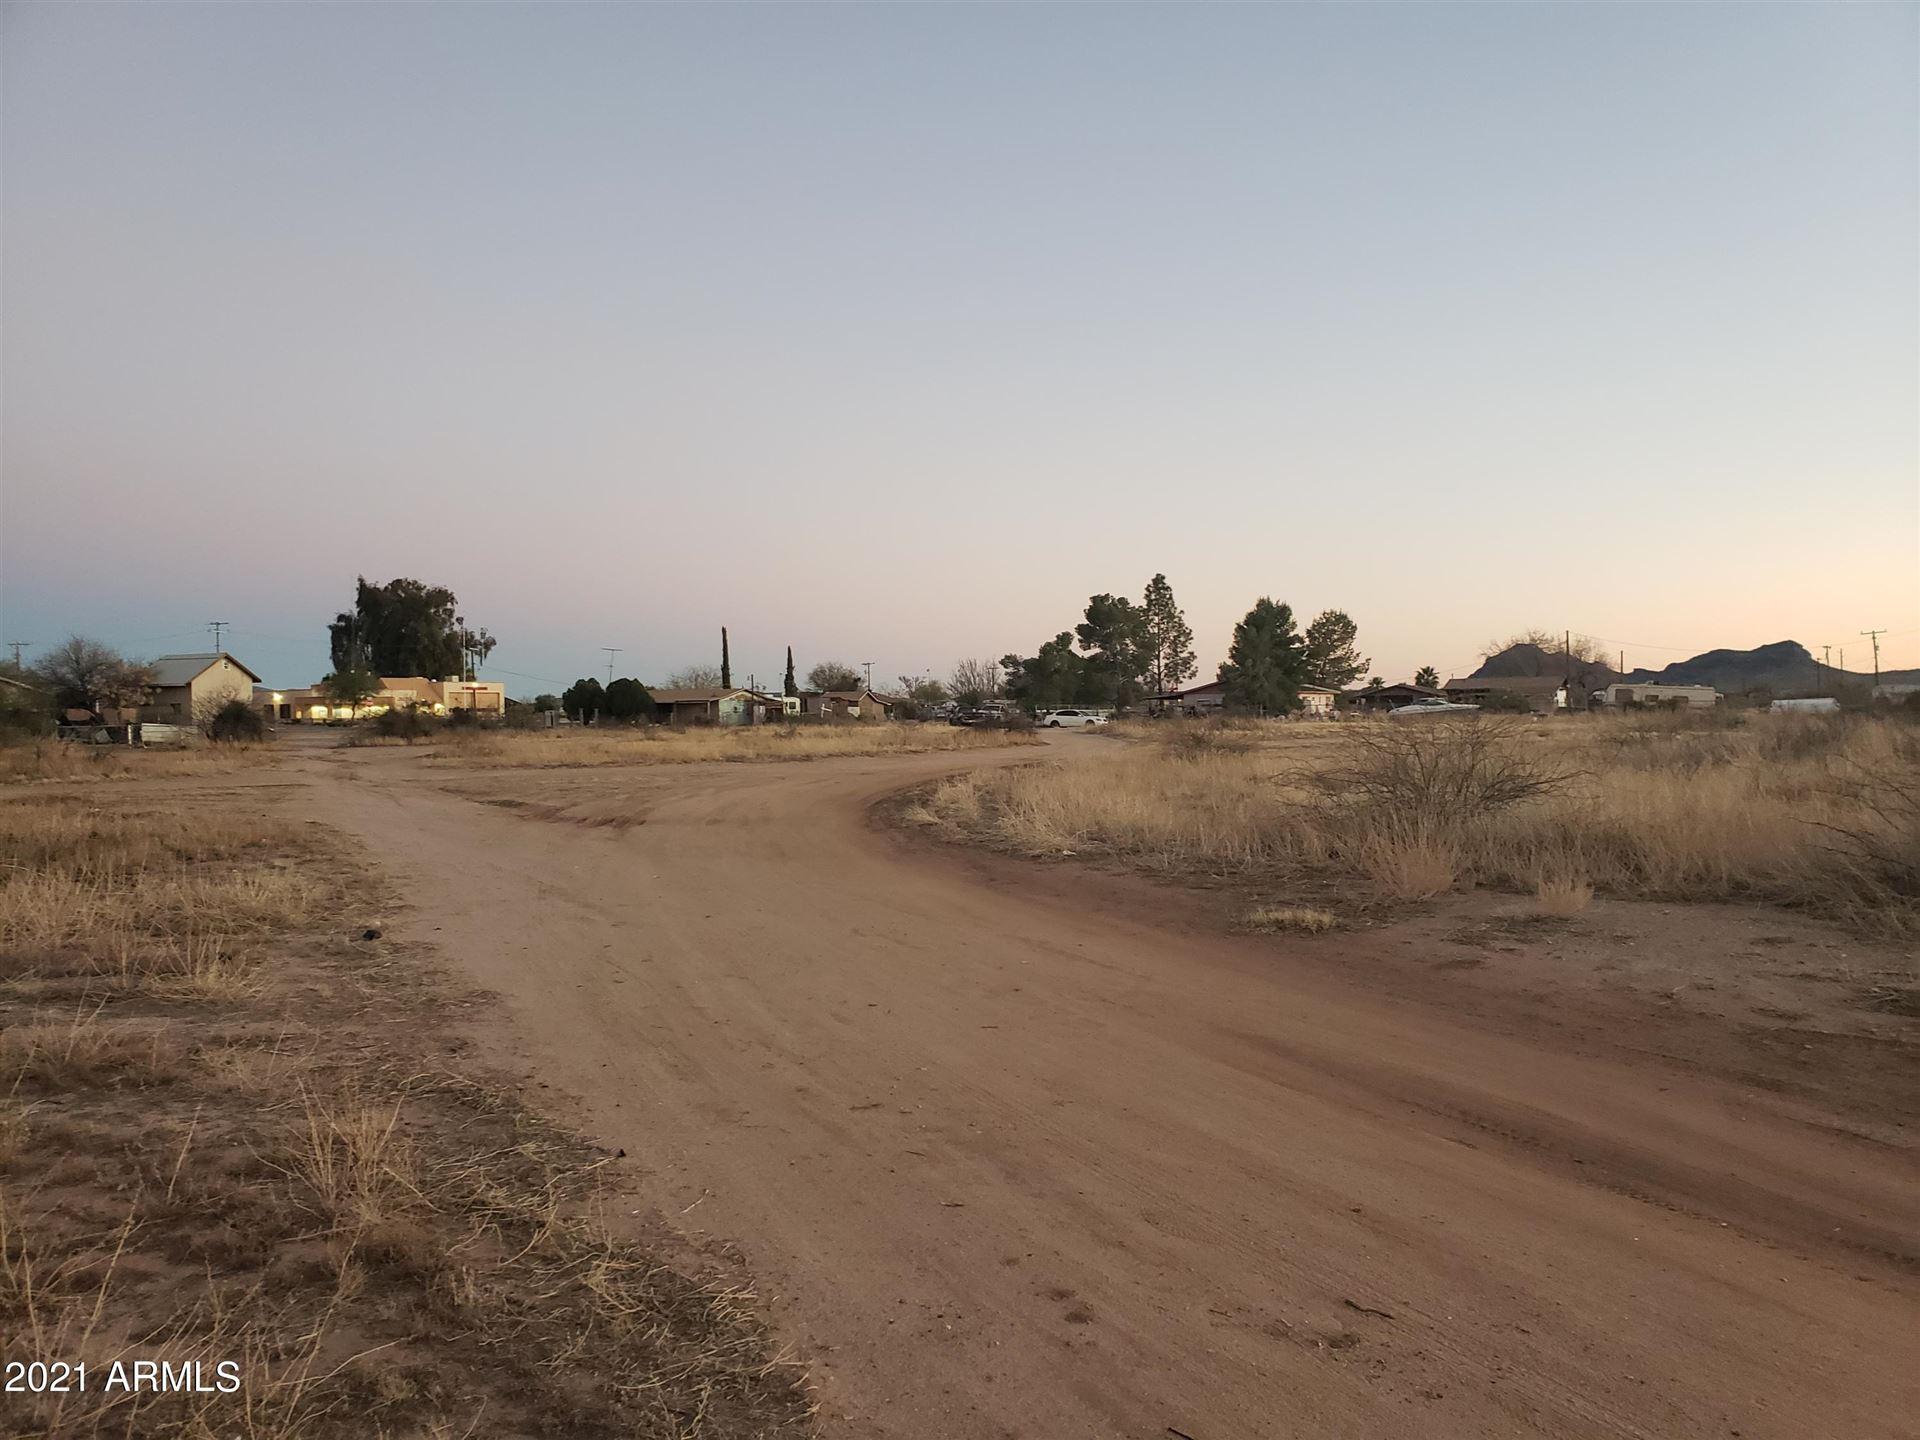 Photo of 0 W Powell St. Lots 7-12 & 24-28 --, Aguila, AZ 85320 (MLS # 6196727)